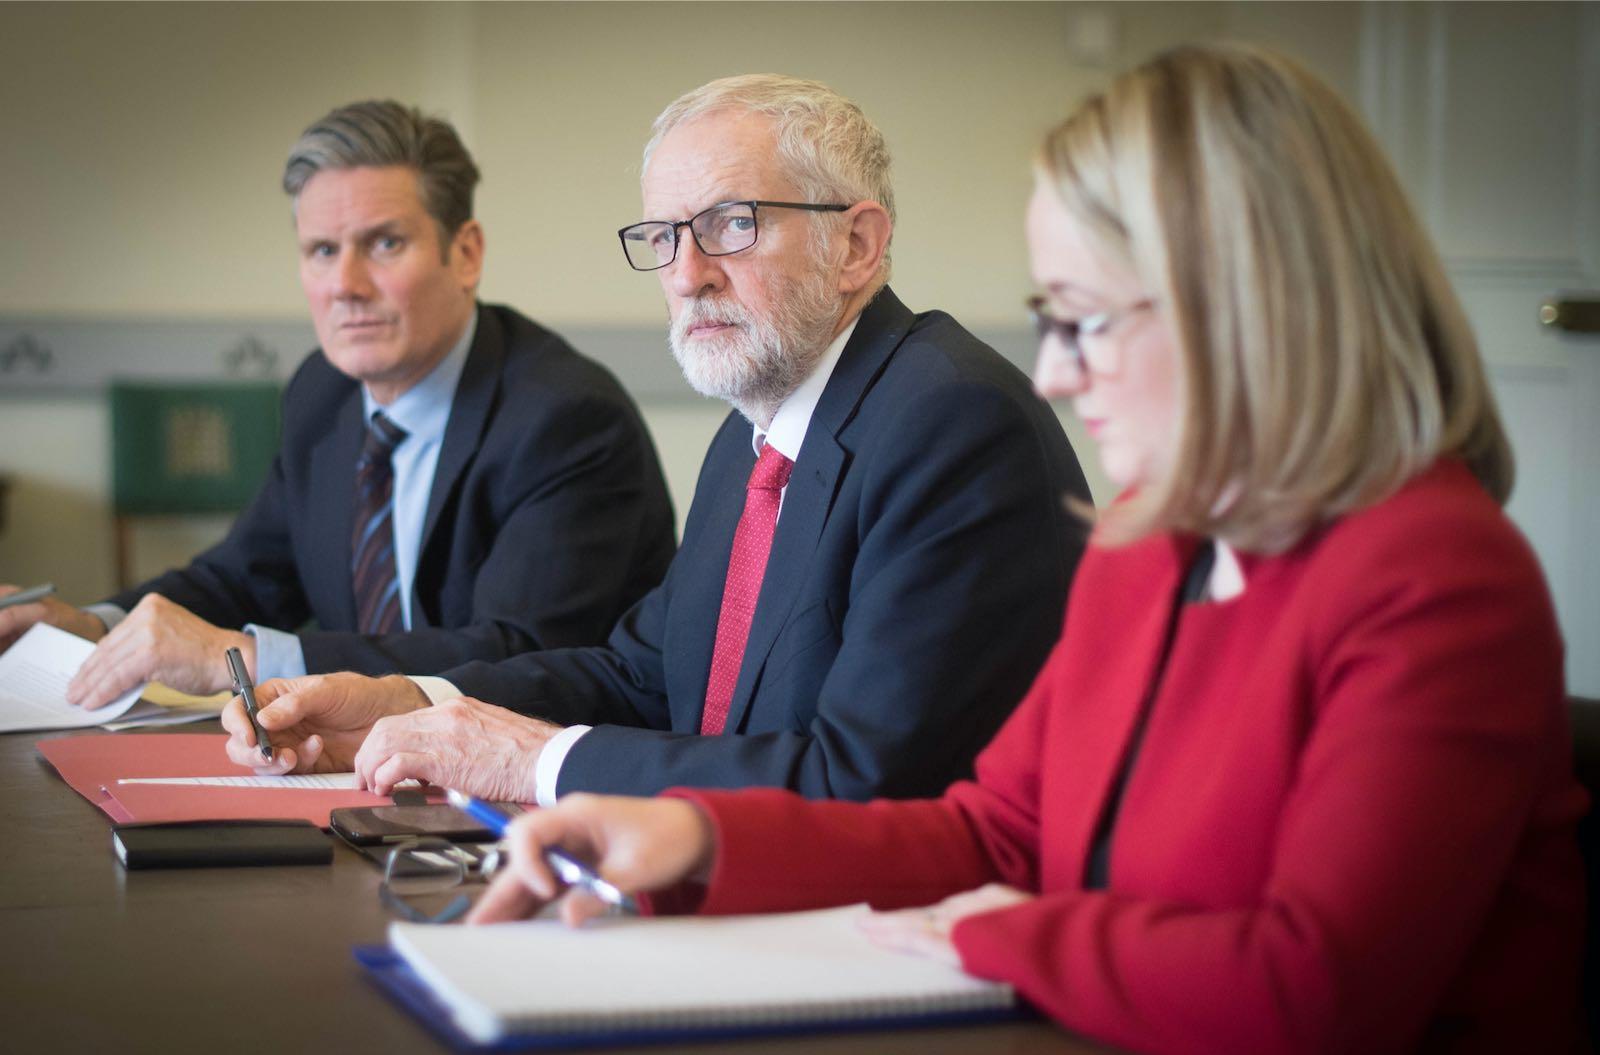 Keir Starmer, Jeremy Corbyn, and Rebecca Long-Bailey, 2019